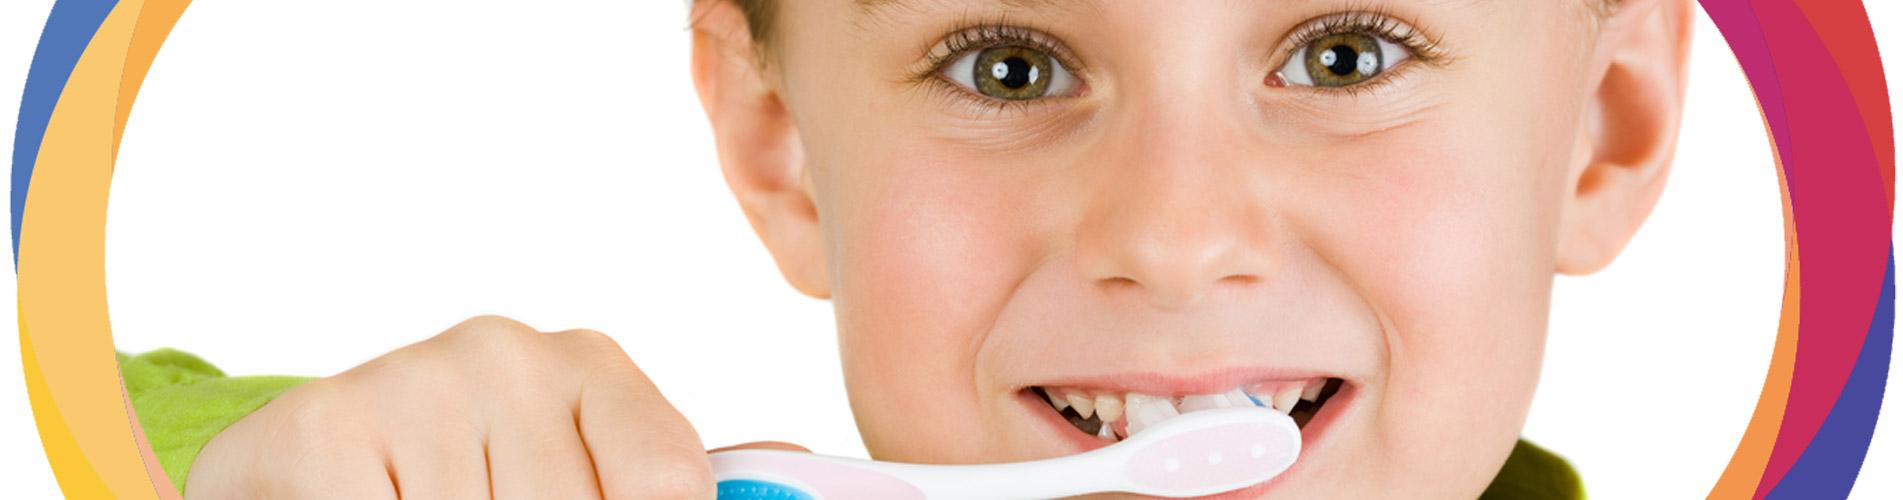 how to become dental preferred hbf provider